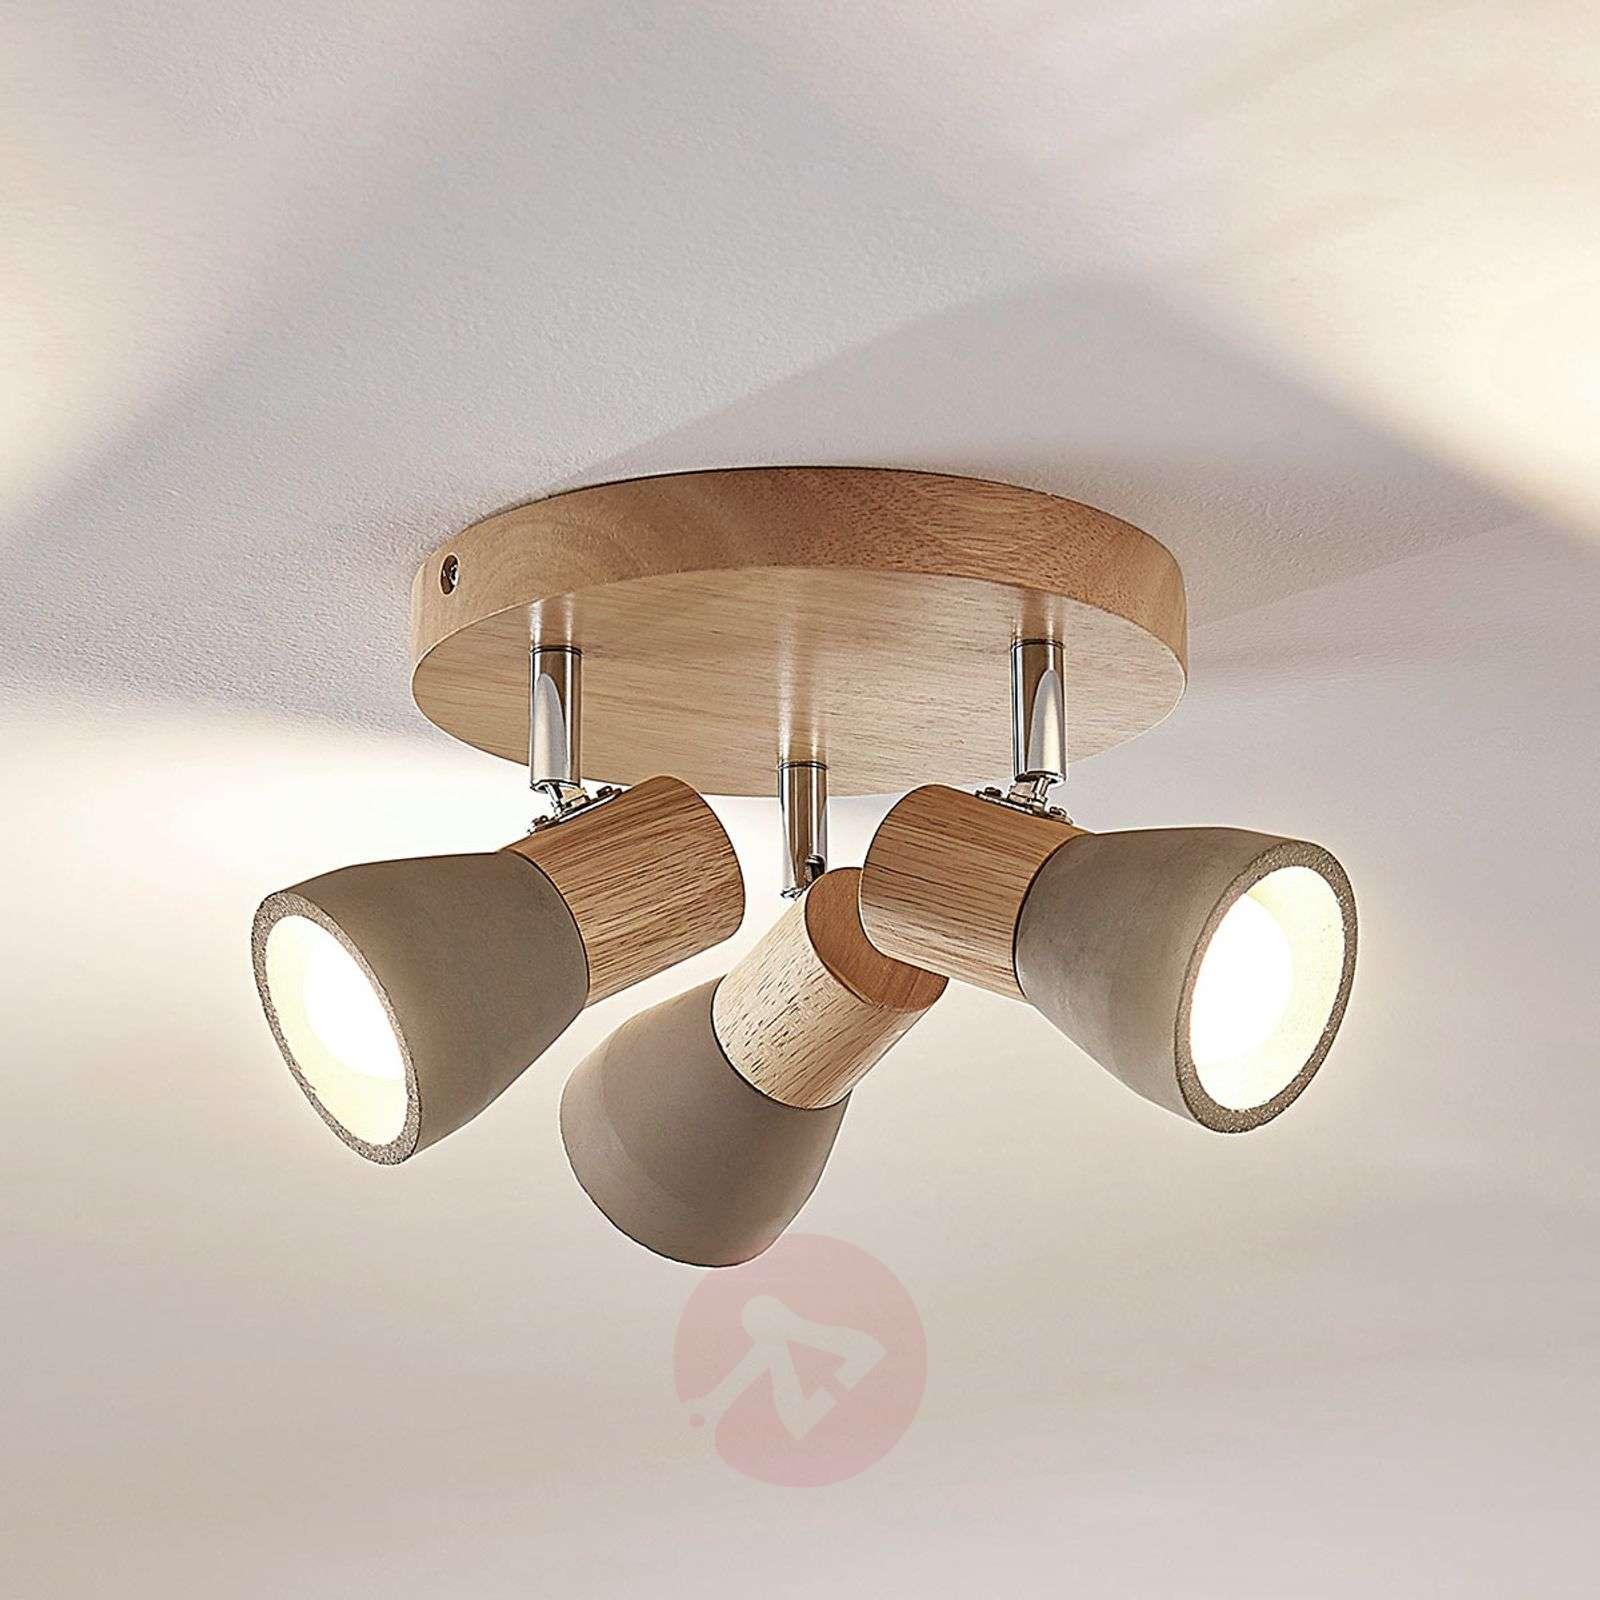 Wood spotlight Filiz concrete lampshades LED bulbs-9621839-01